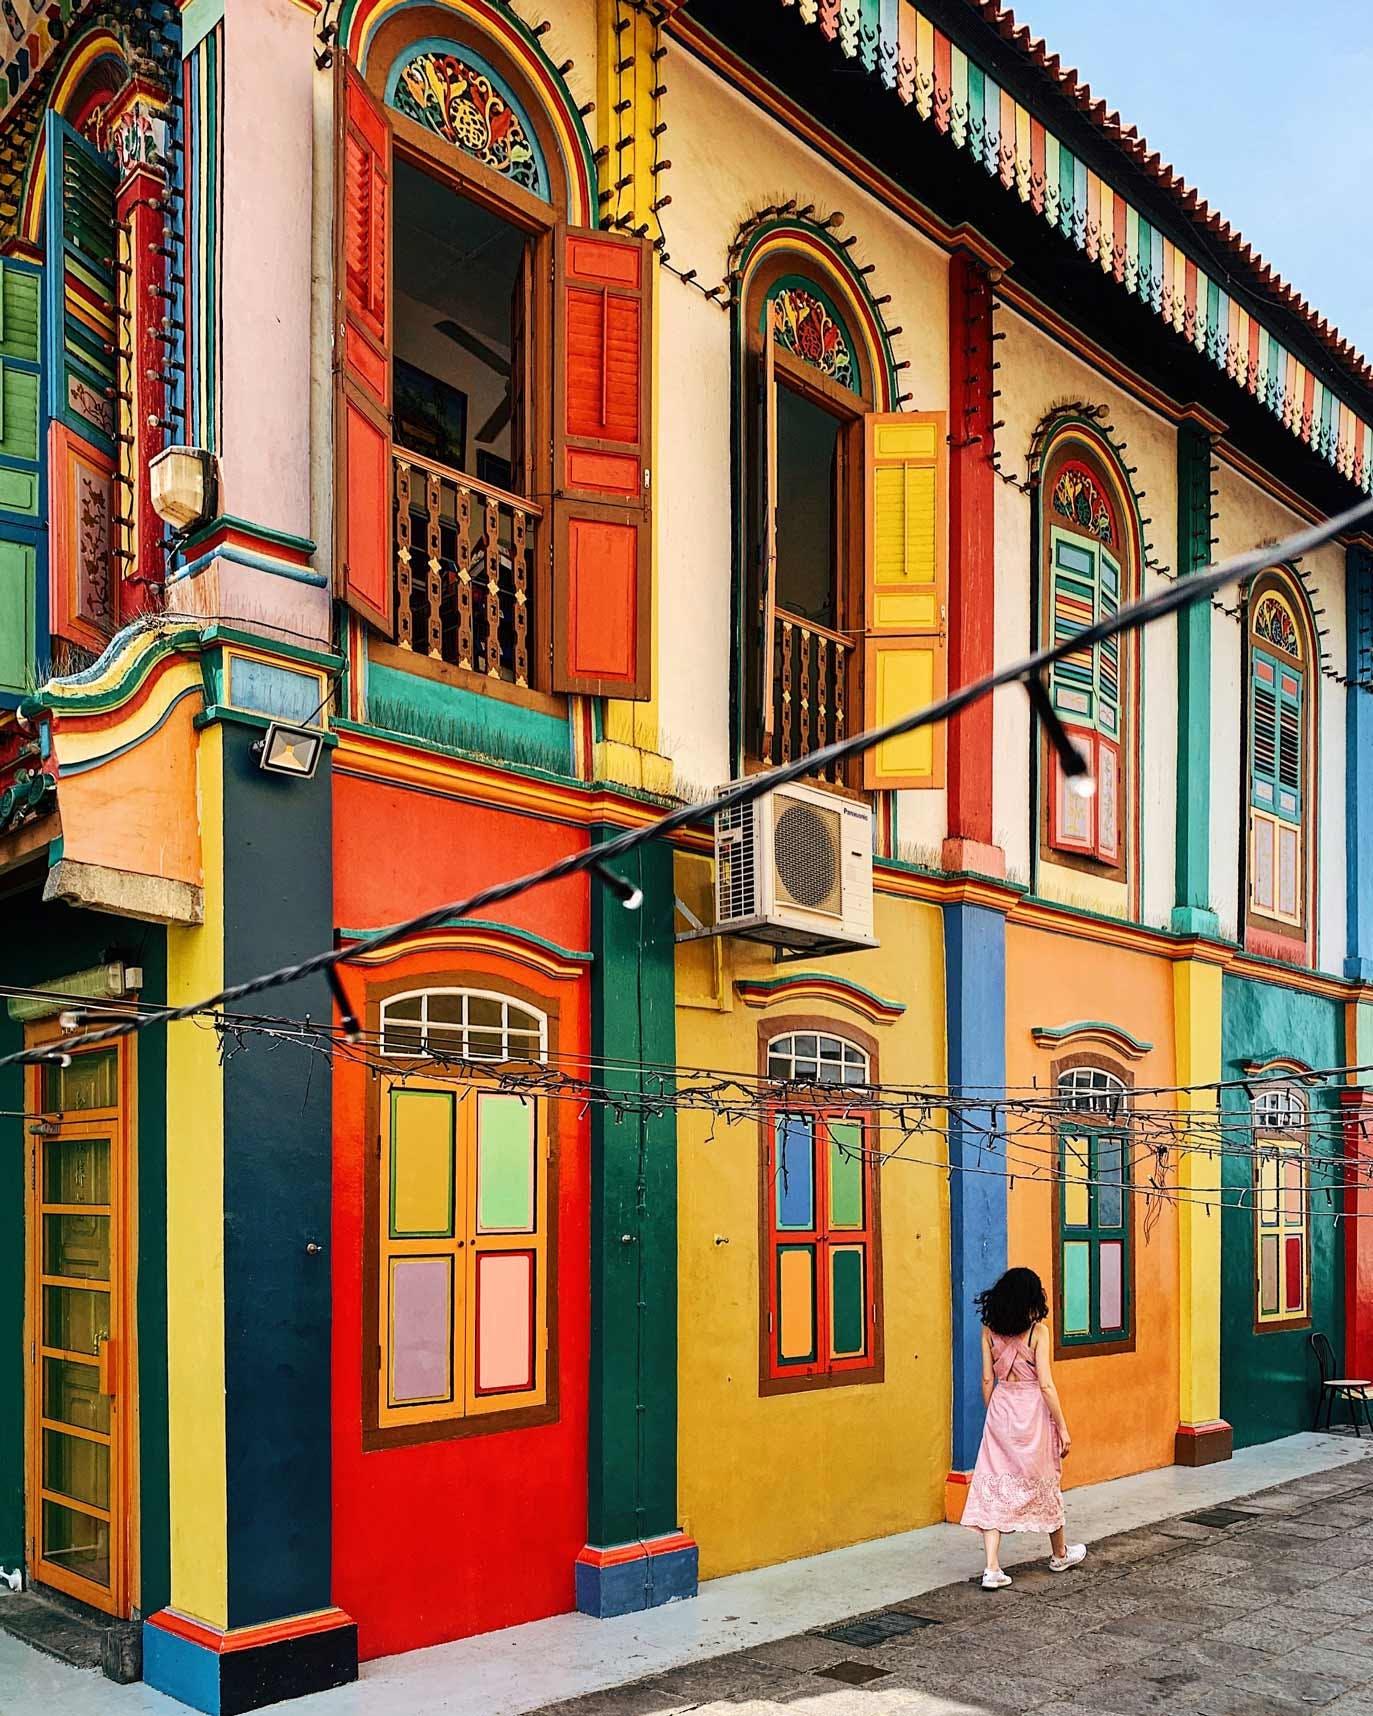 Tan Teng Niah Colorful Villa